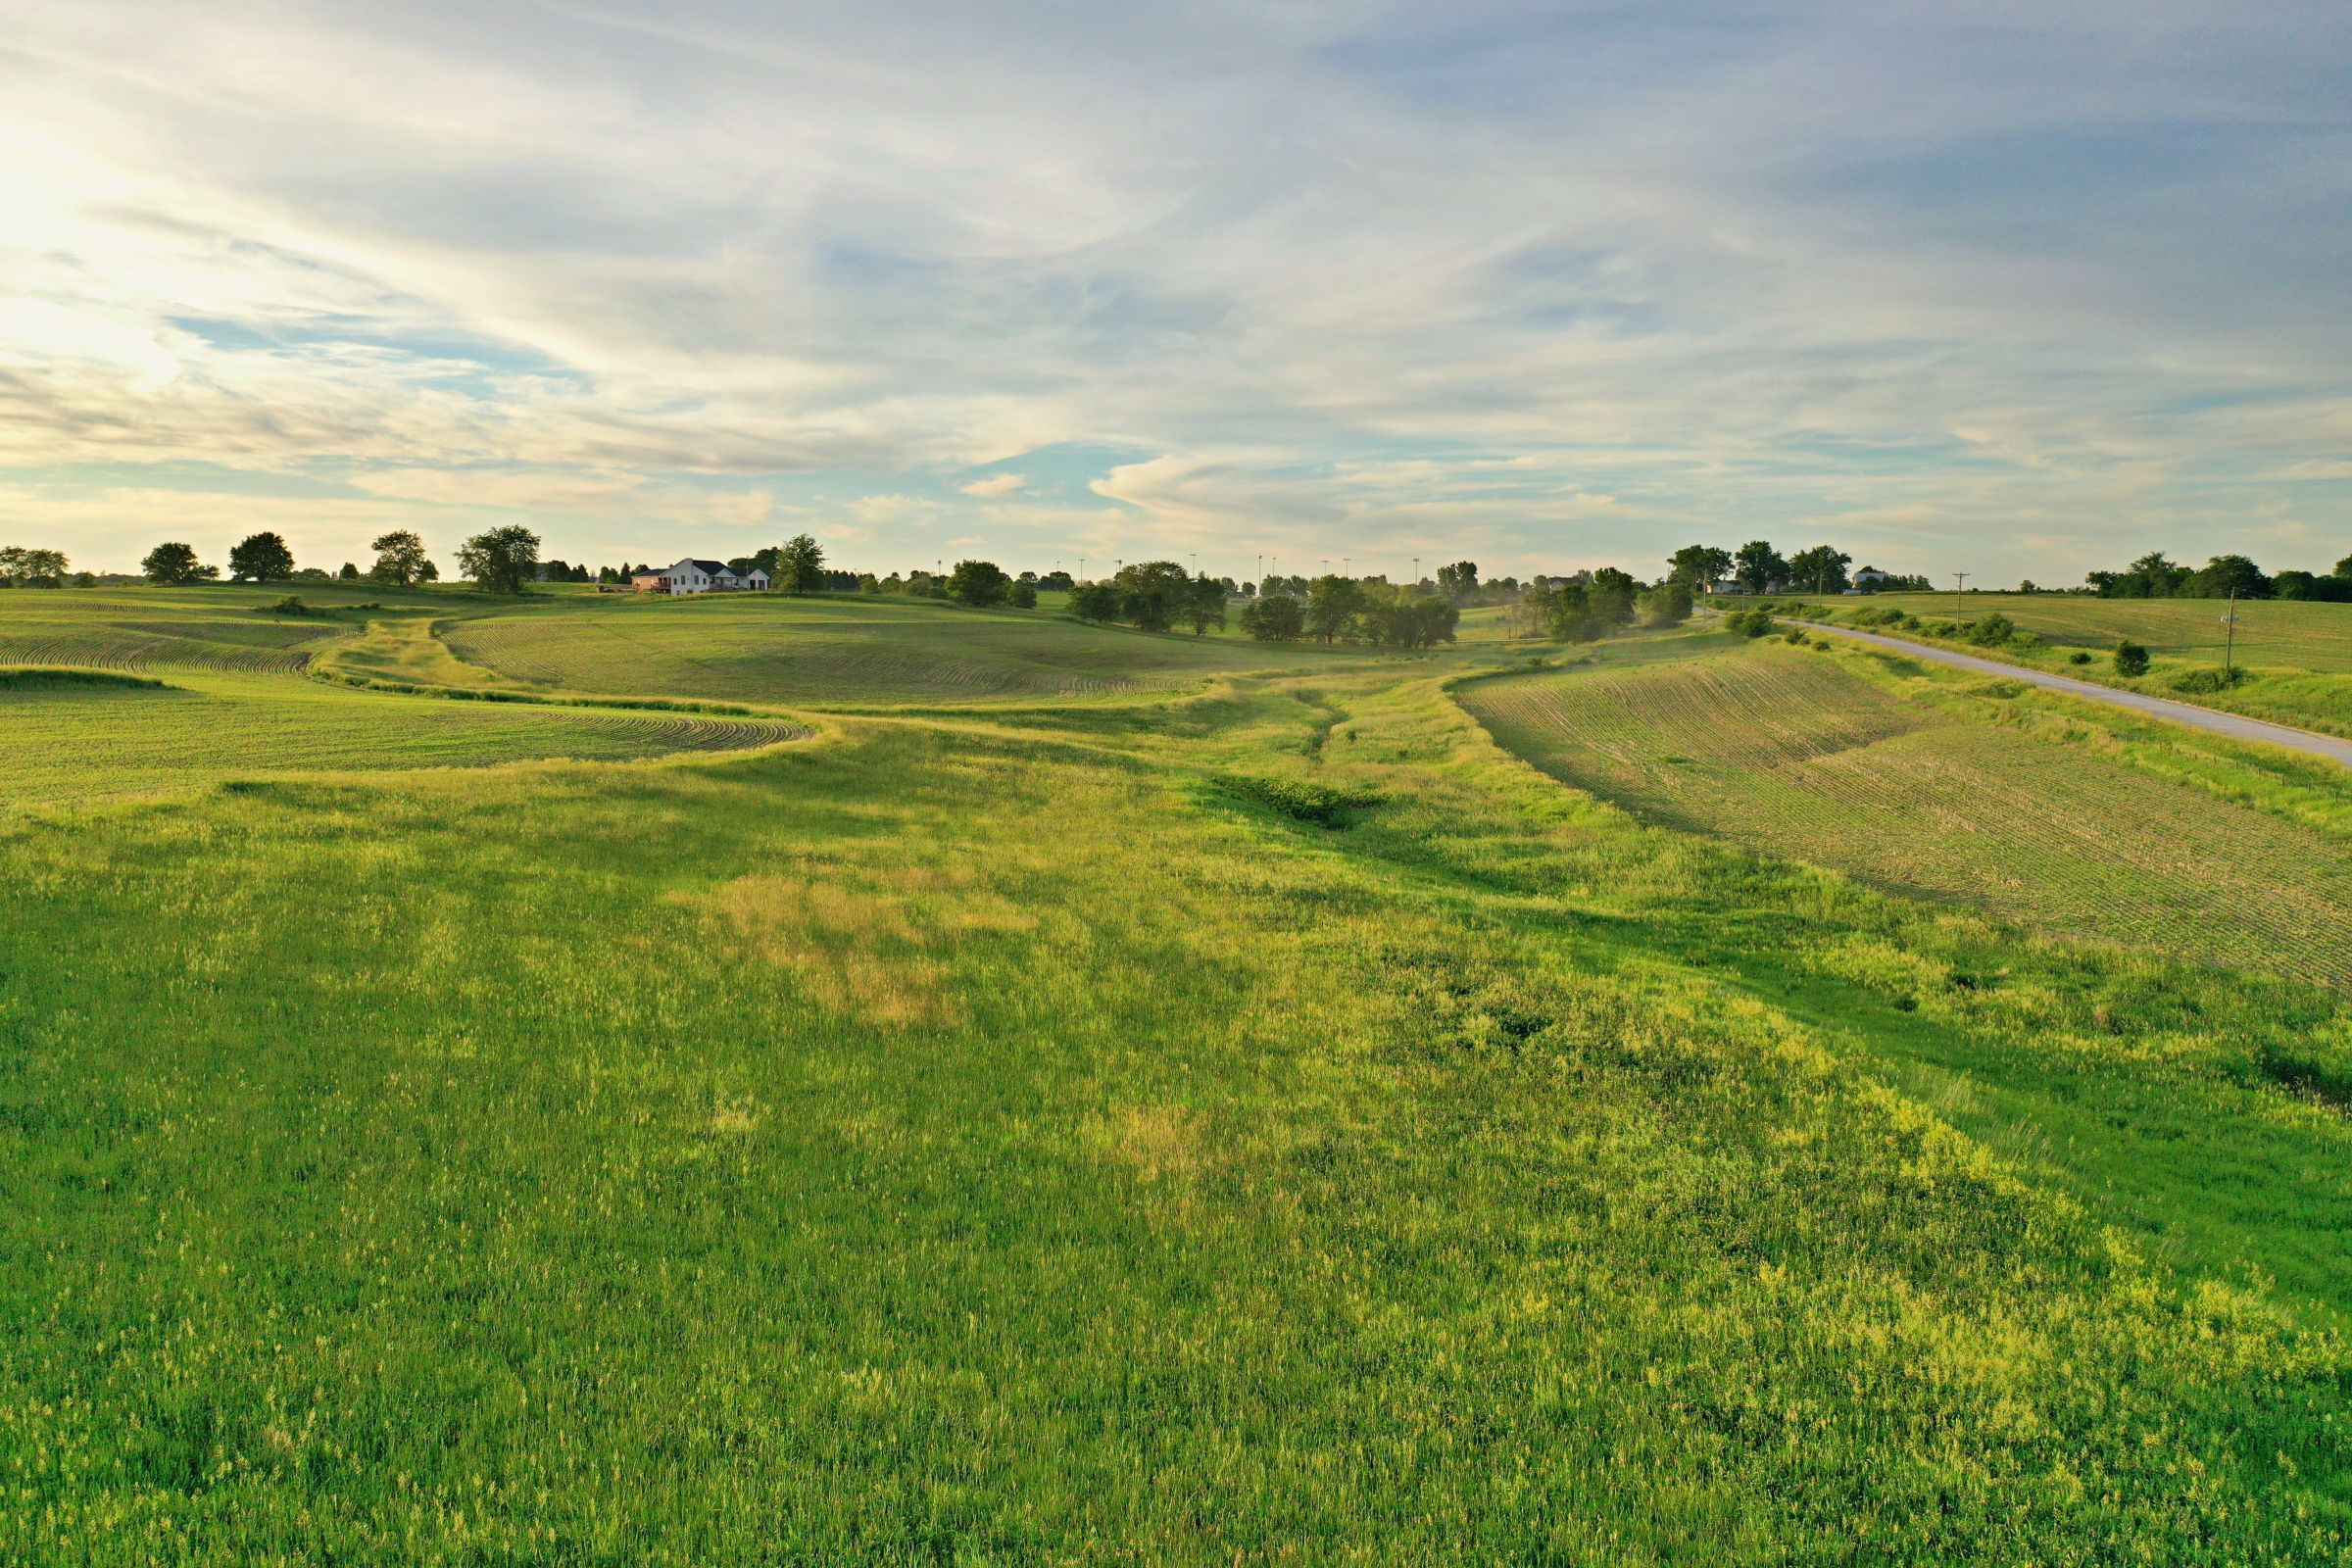 development-land-warren-county-iowa-20-acres-listing-number-15424-1-2021-03-25-201255.JPG